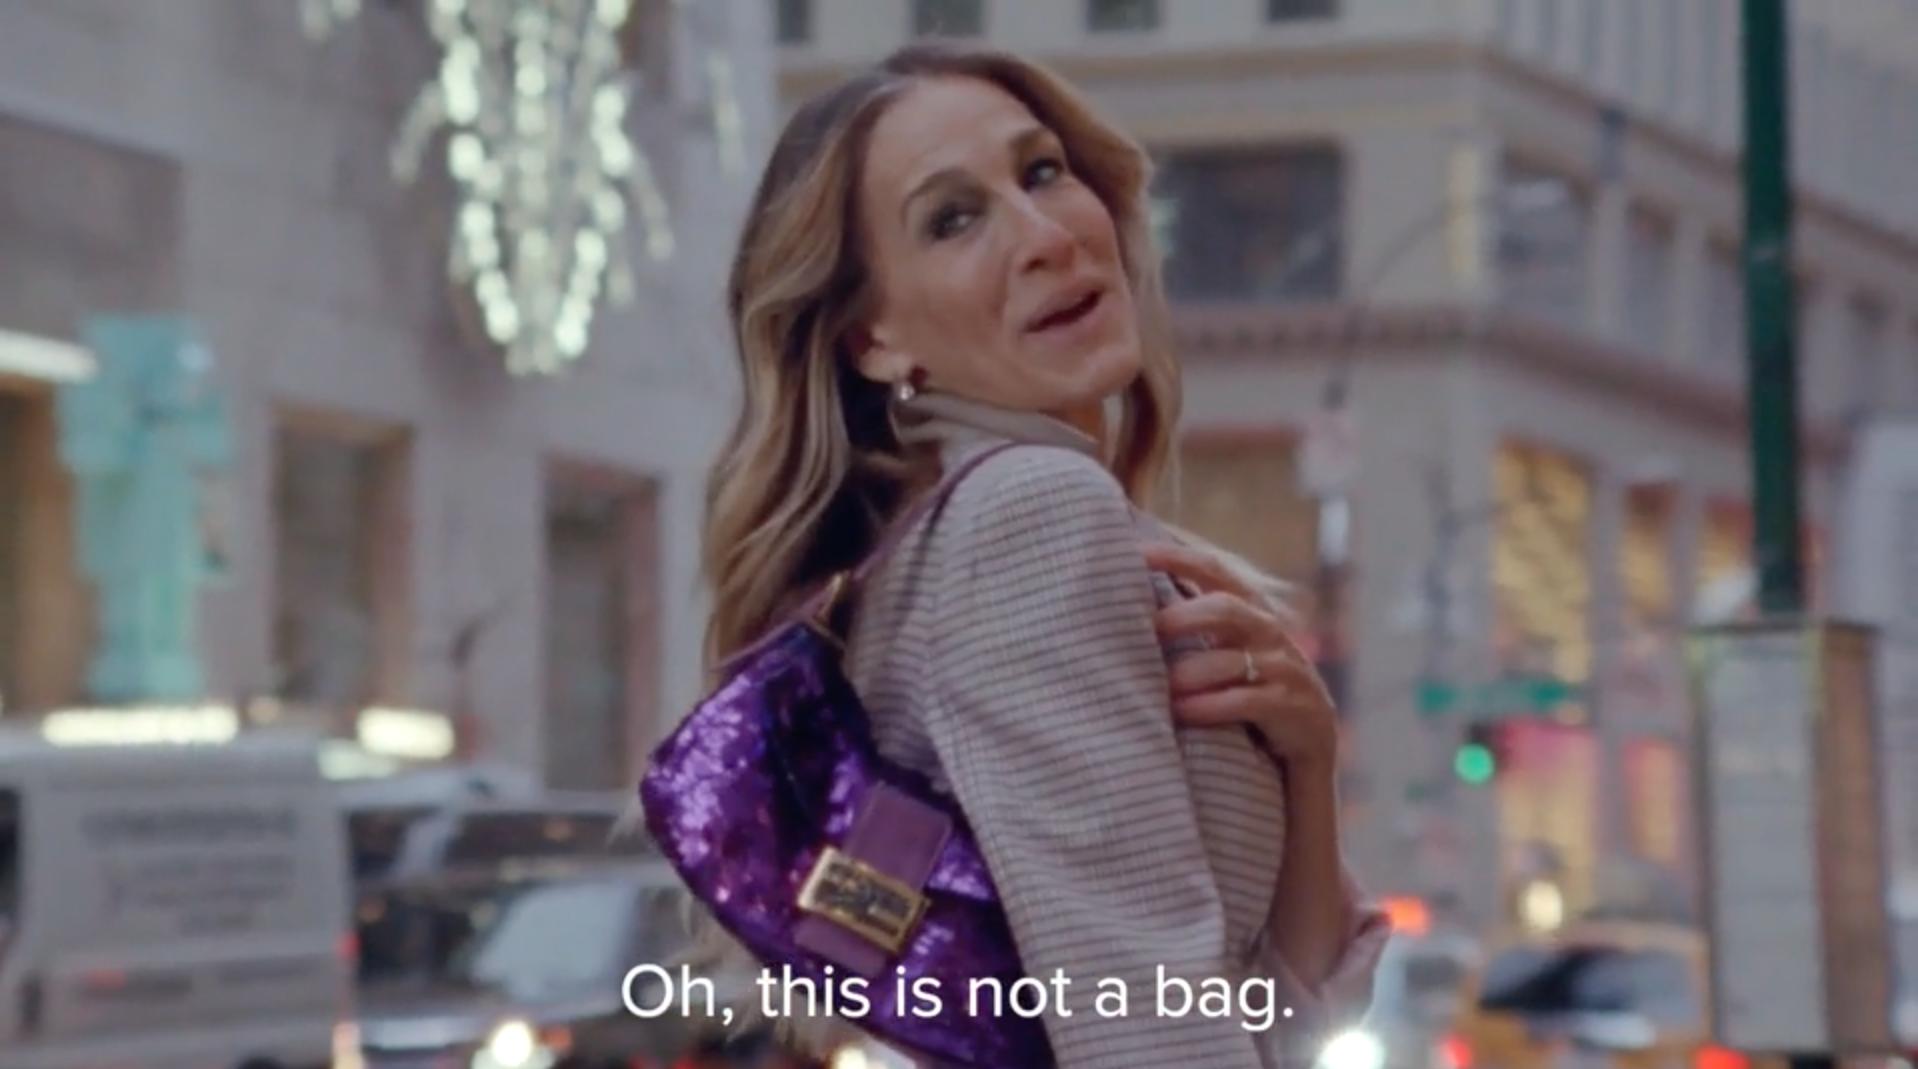 Sarah Jessica Parker anuncio de Fendi